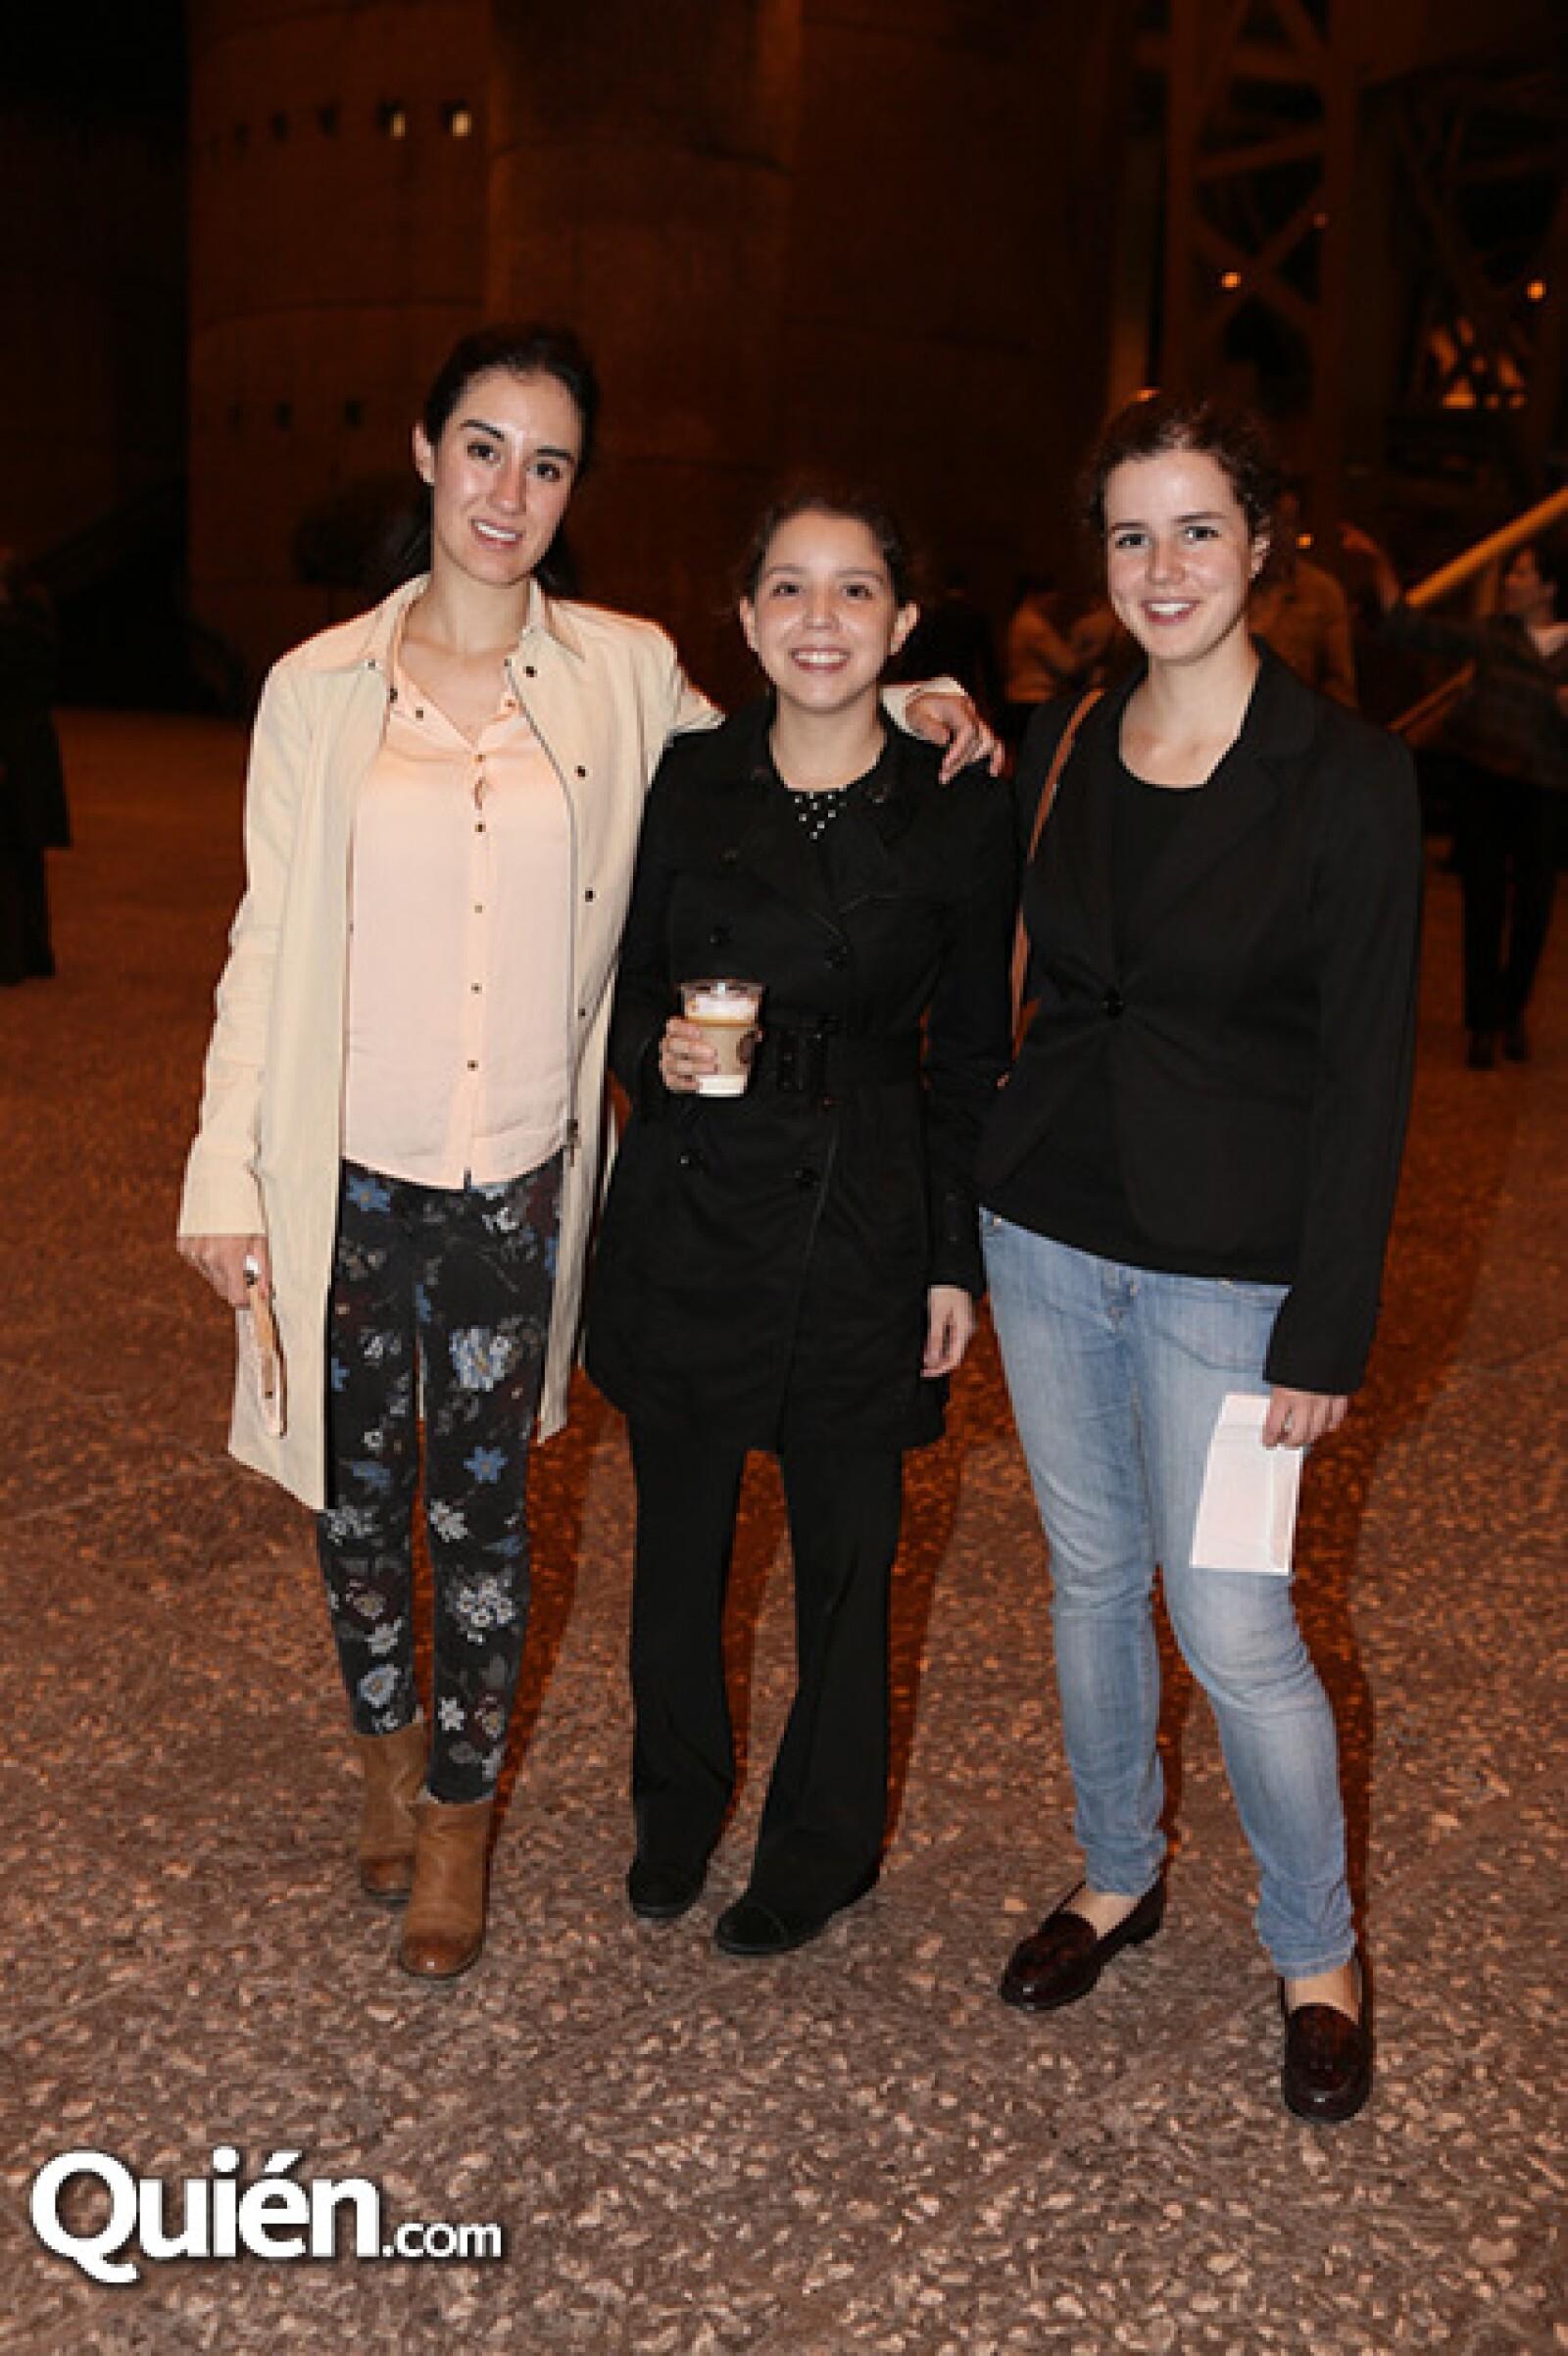 Paula Saavedra, María Gariiela León y Lucía Palomar